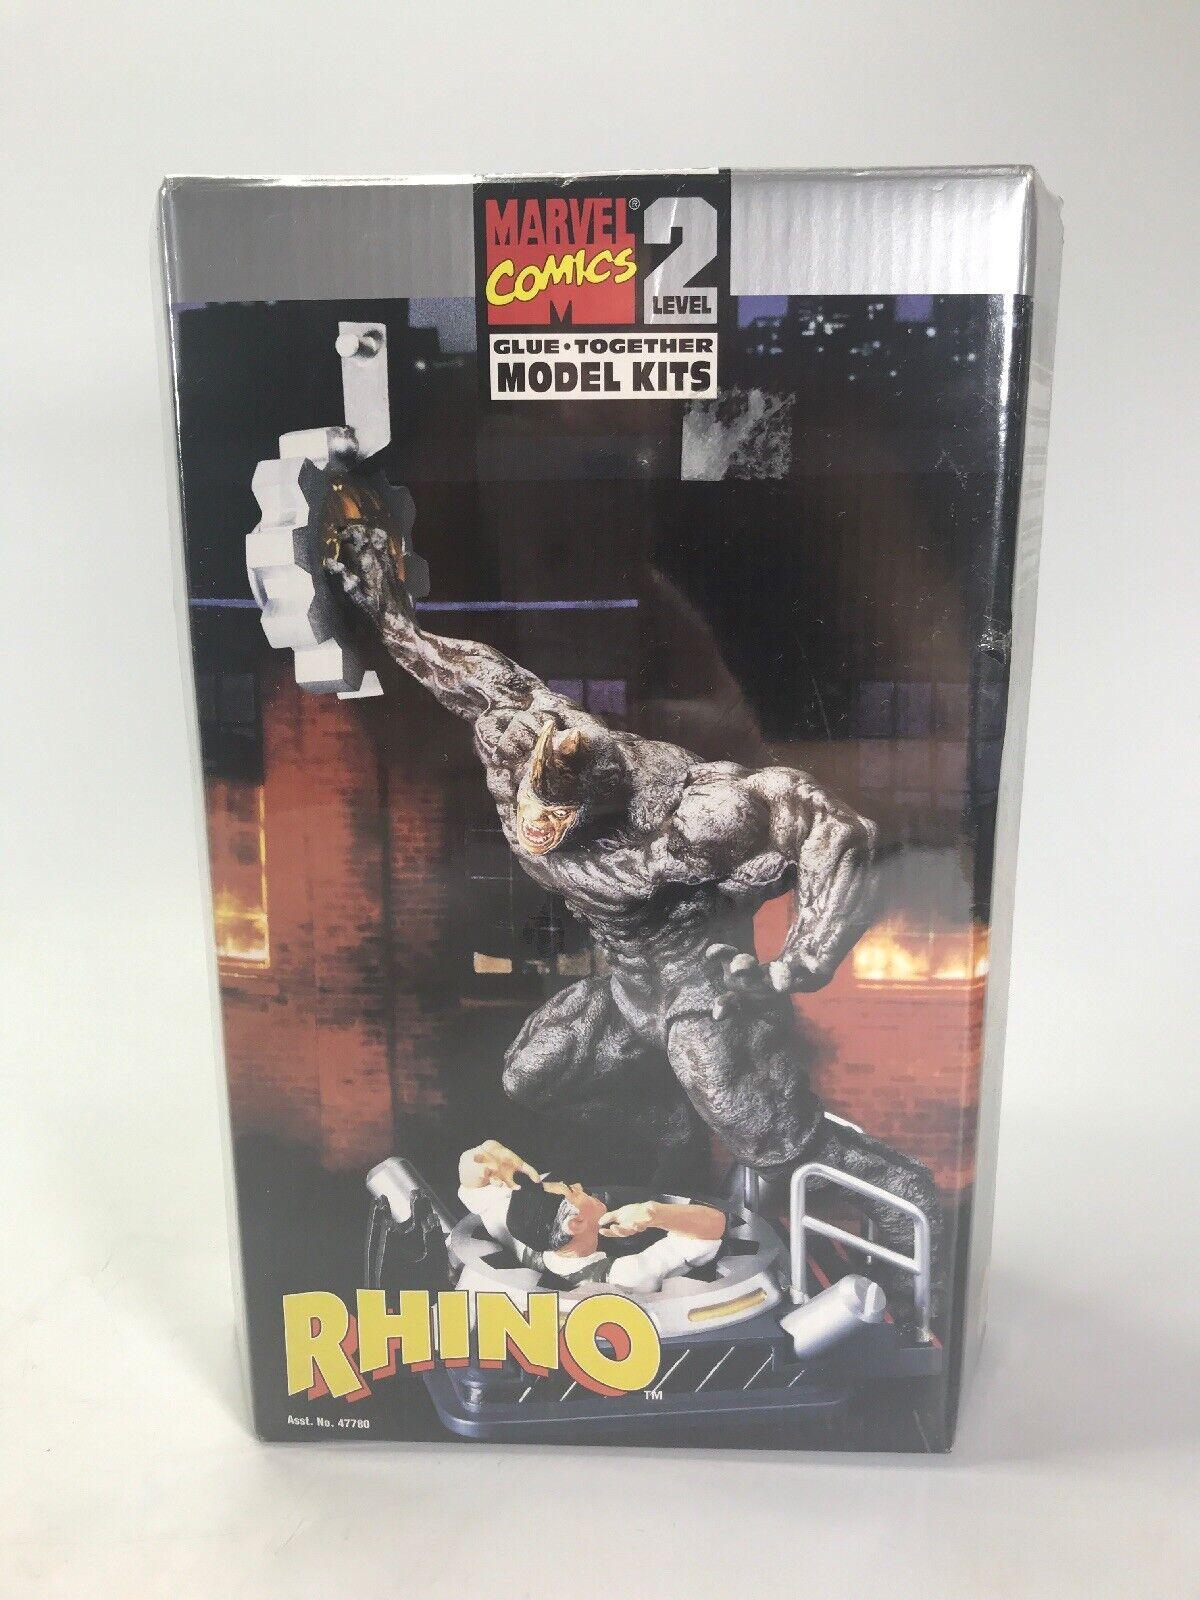 Marvel Comics Spiderman Rhino Model Kit Level 2 Glue Together 1999 Toy Biz